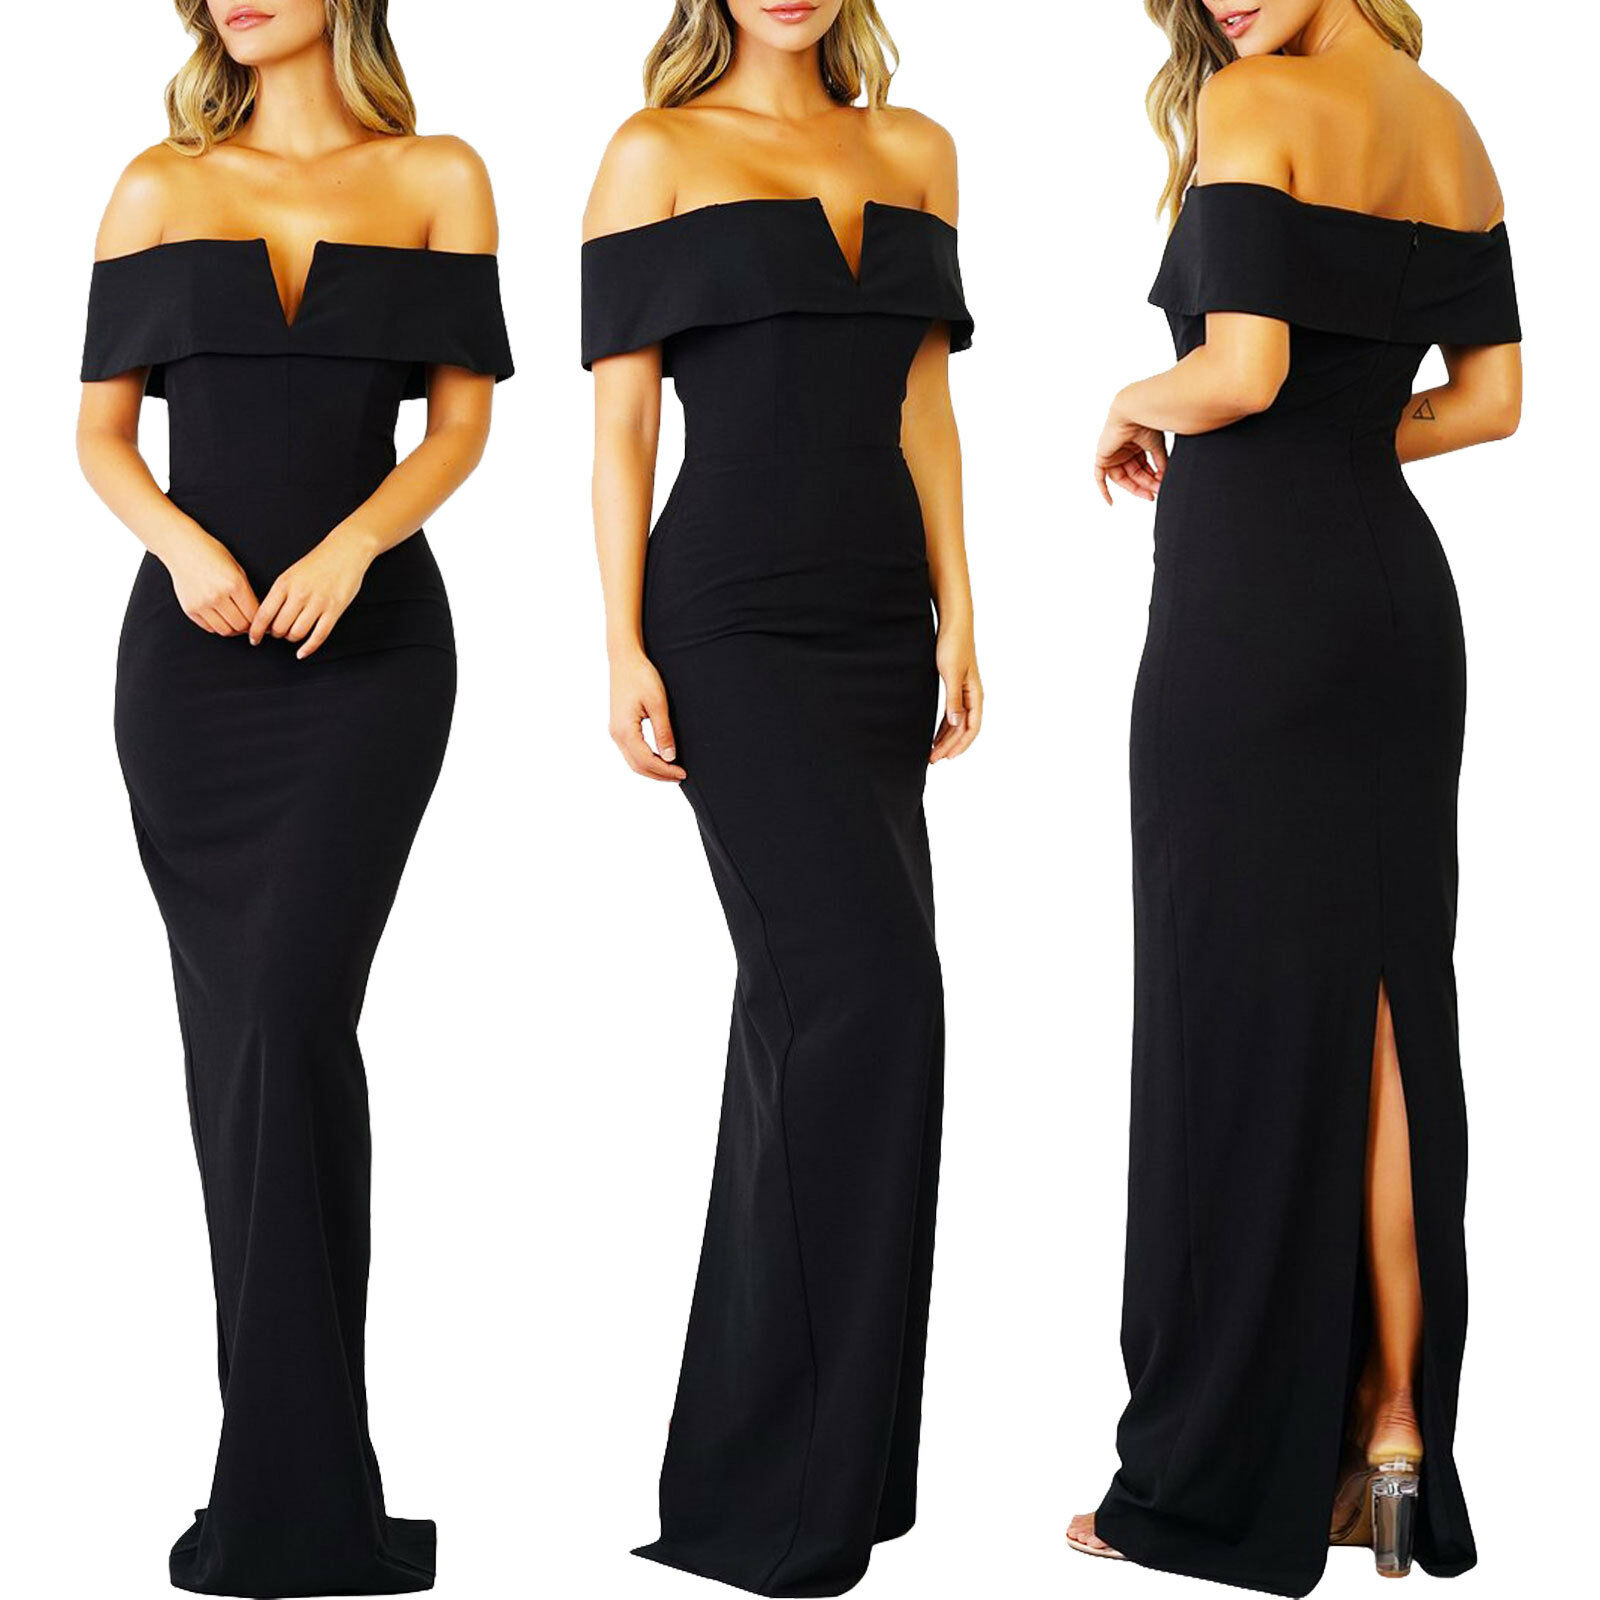 Vestido de women largo espalda desnudo sirena elegante ceremonia nuevo DL-2214